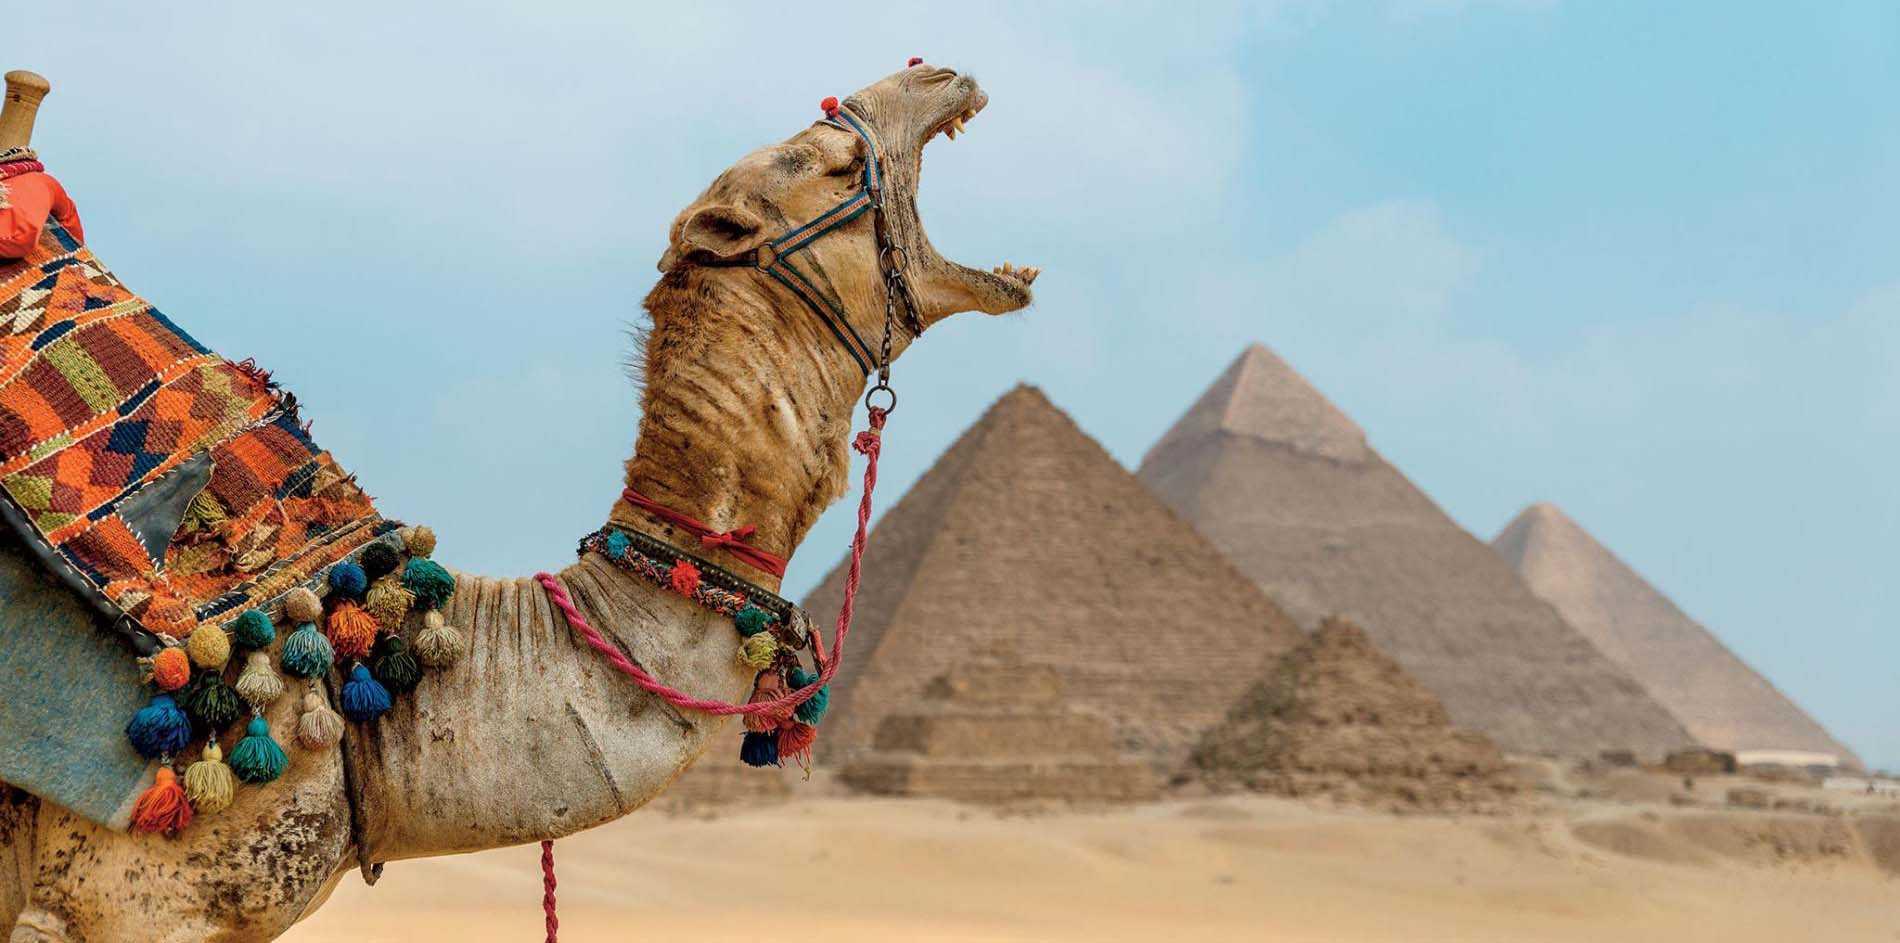 aegypten-familienurlaub